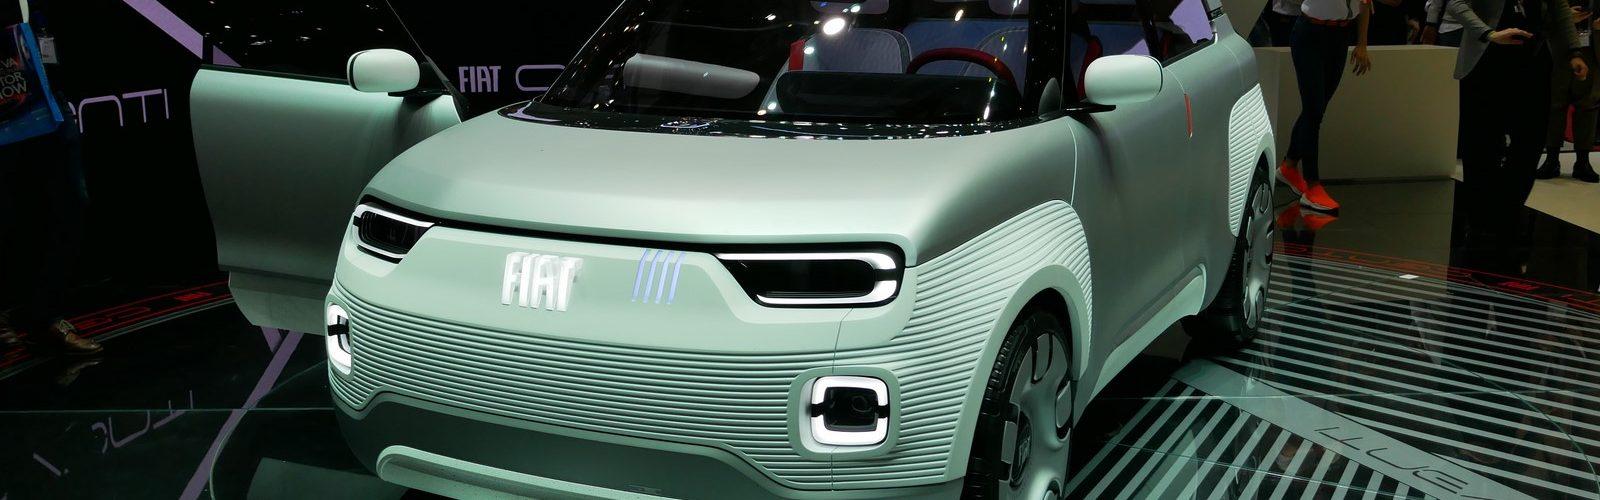 Fiat Centoventi LNA GA Geneva 2019 4